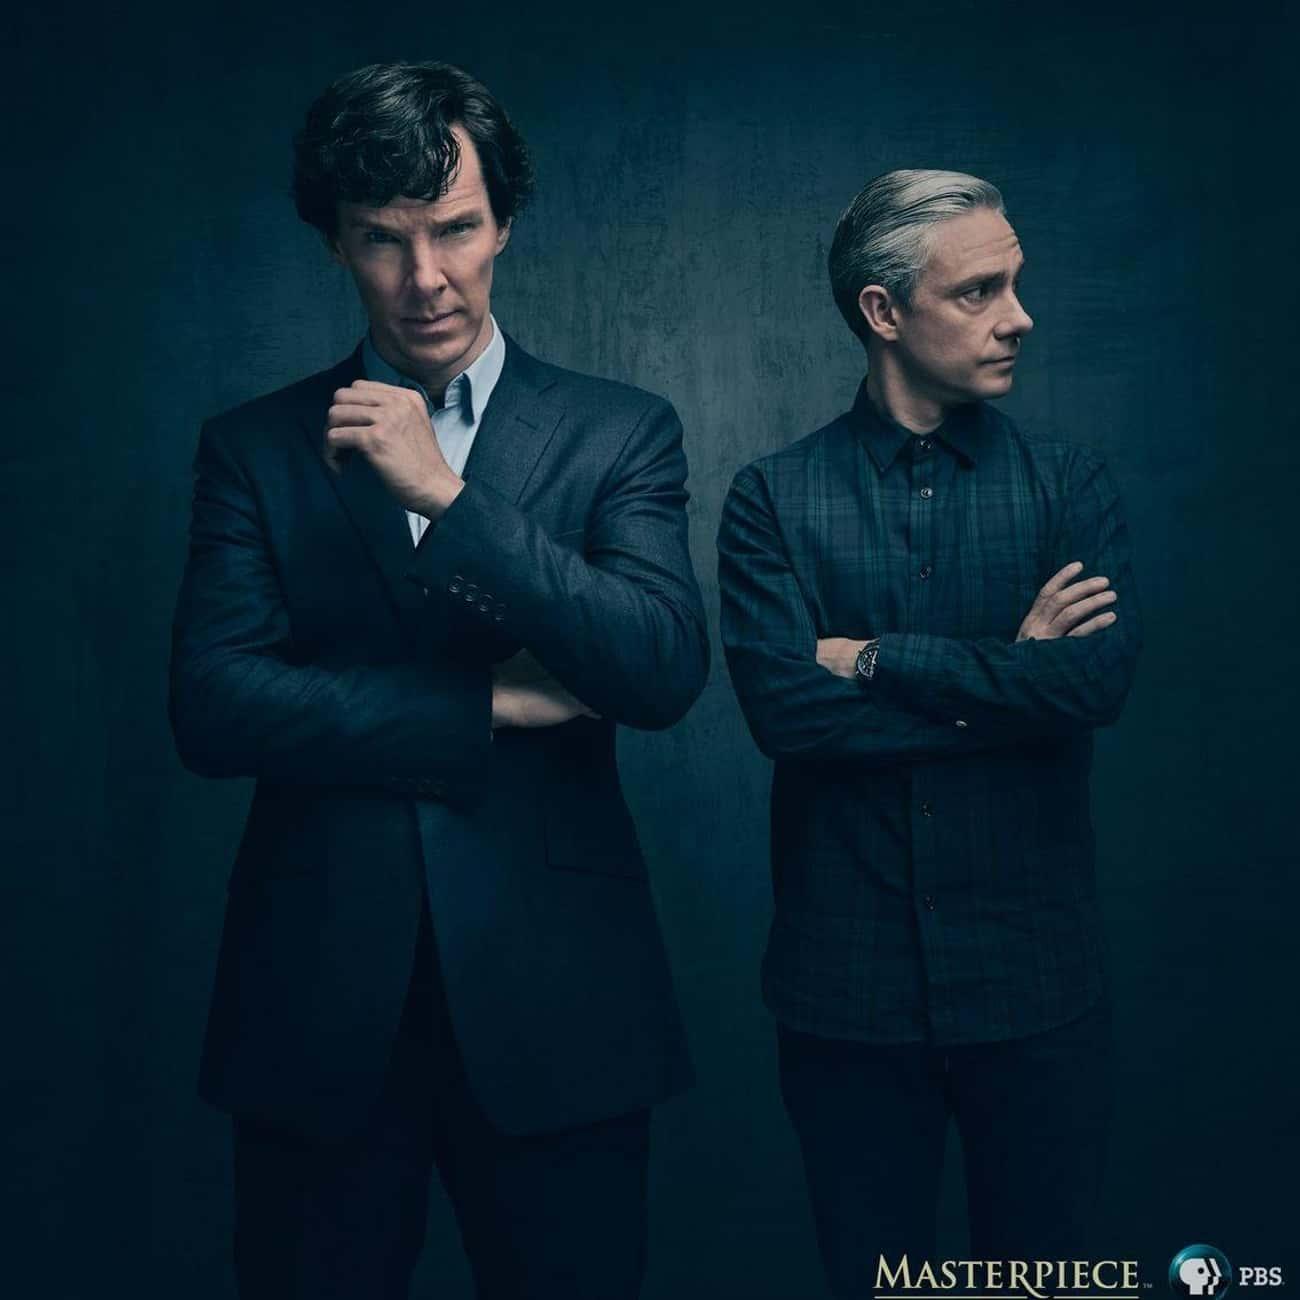 Sherlock - Season 4 is listed (or ranked) 4 on the list Ranking the Best Seasons of 'Sherlock'